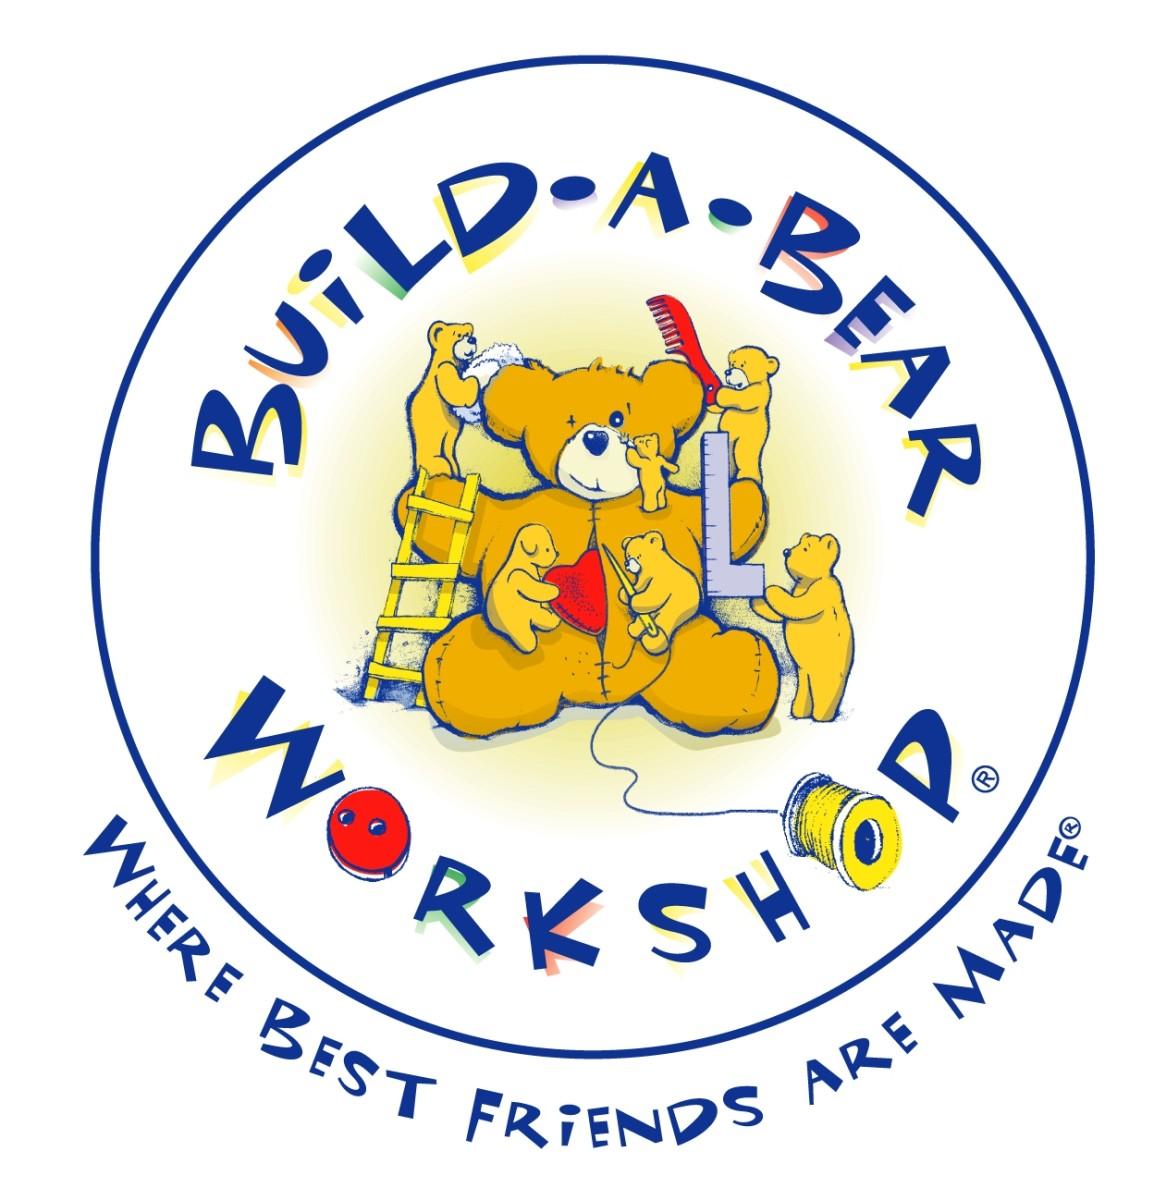 Build-A-Bear Workshop's first logo.